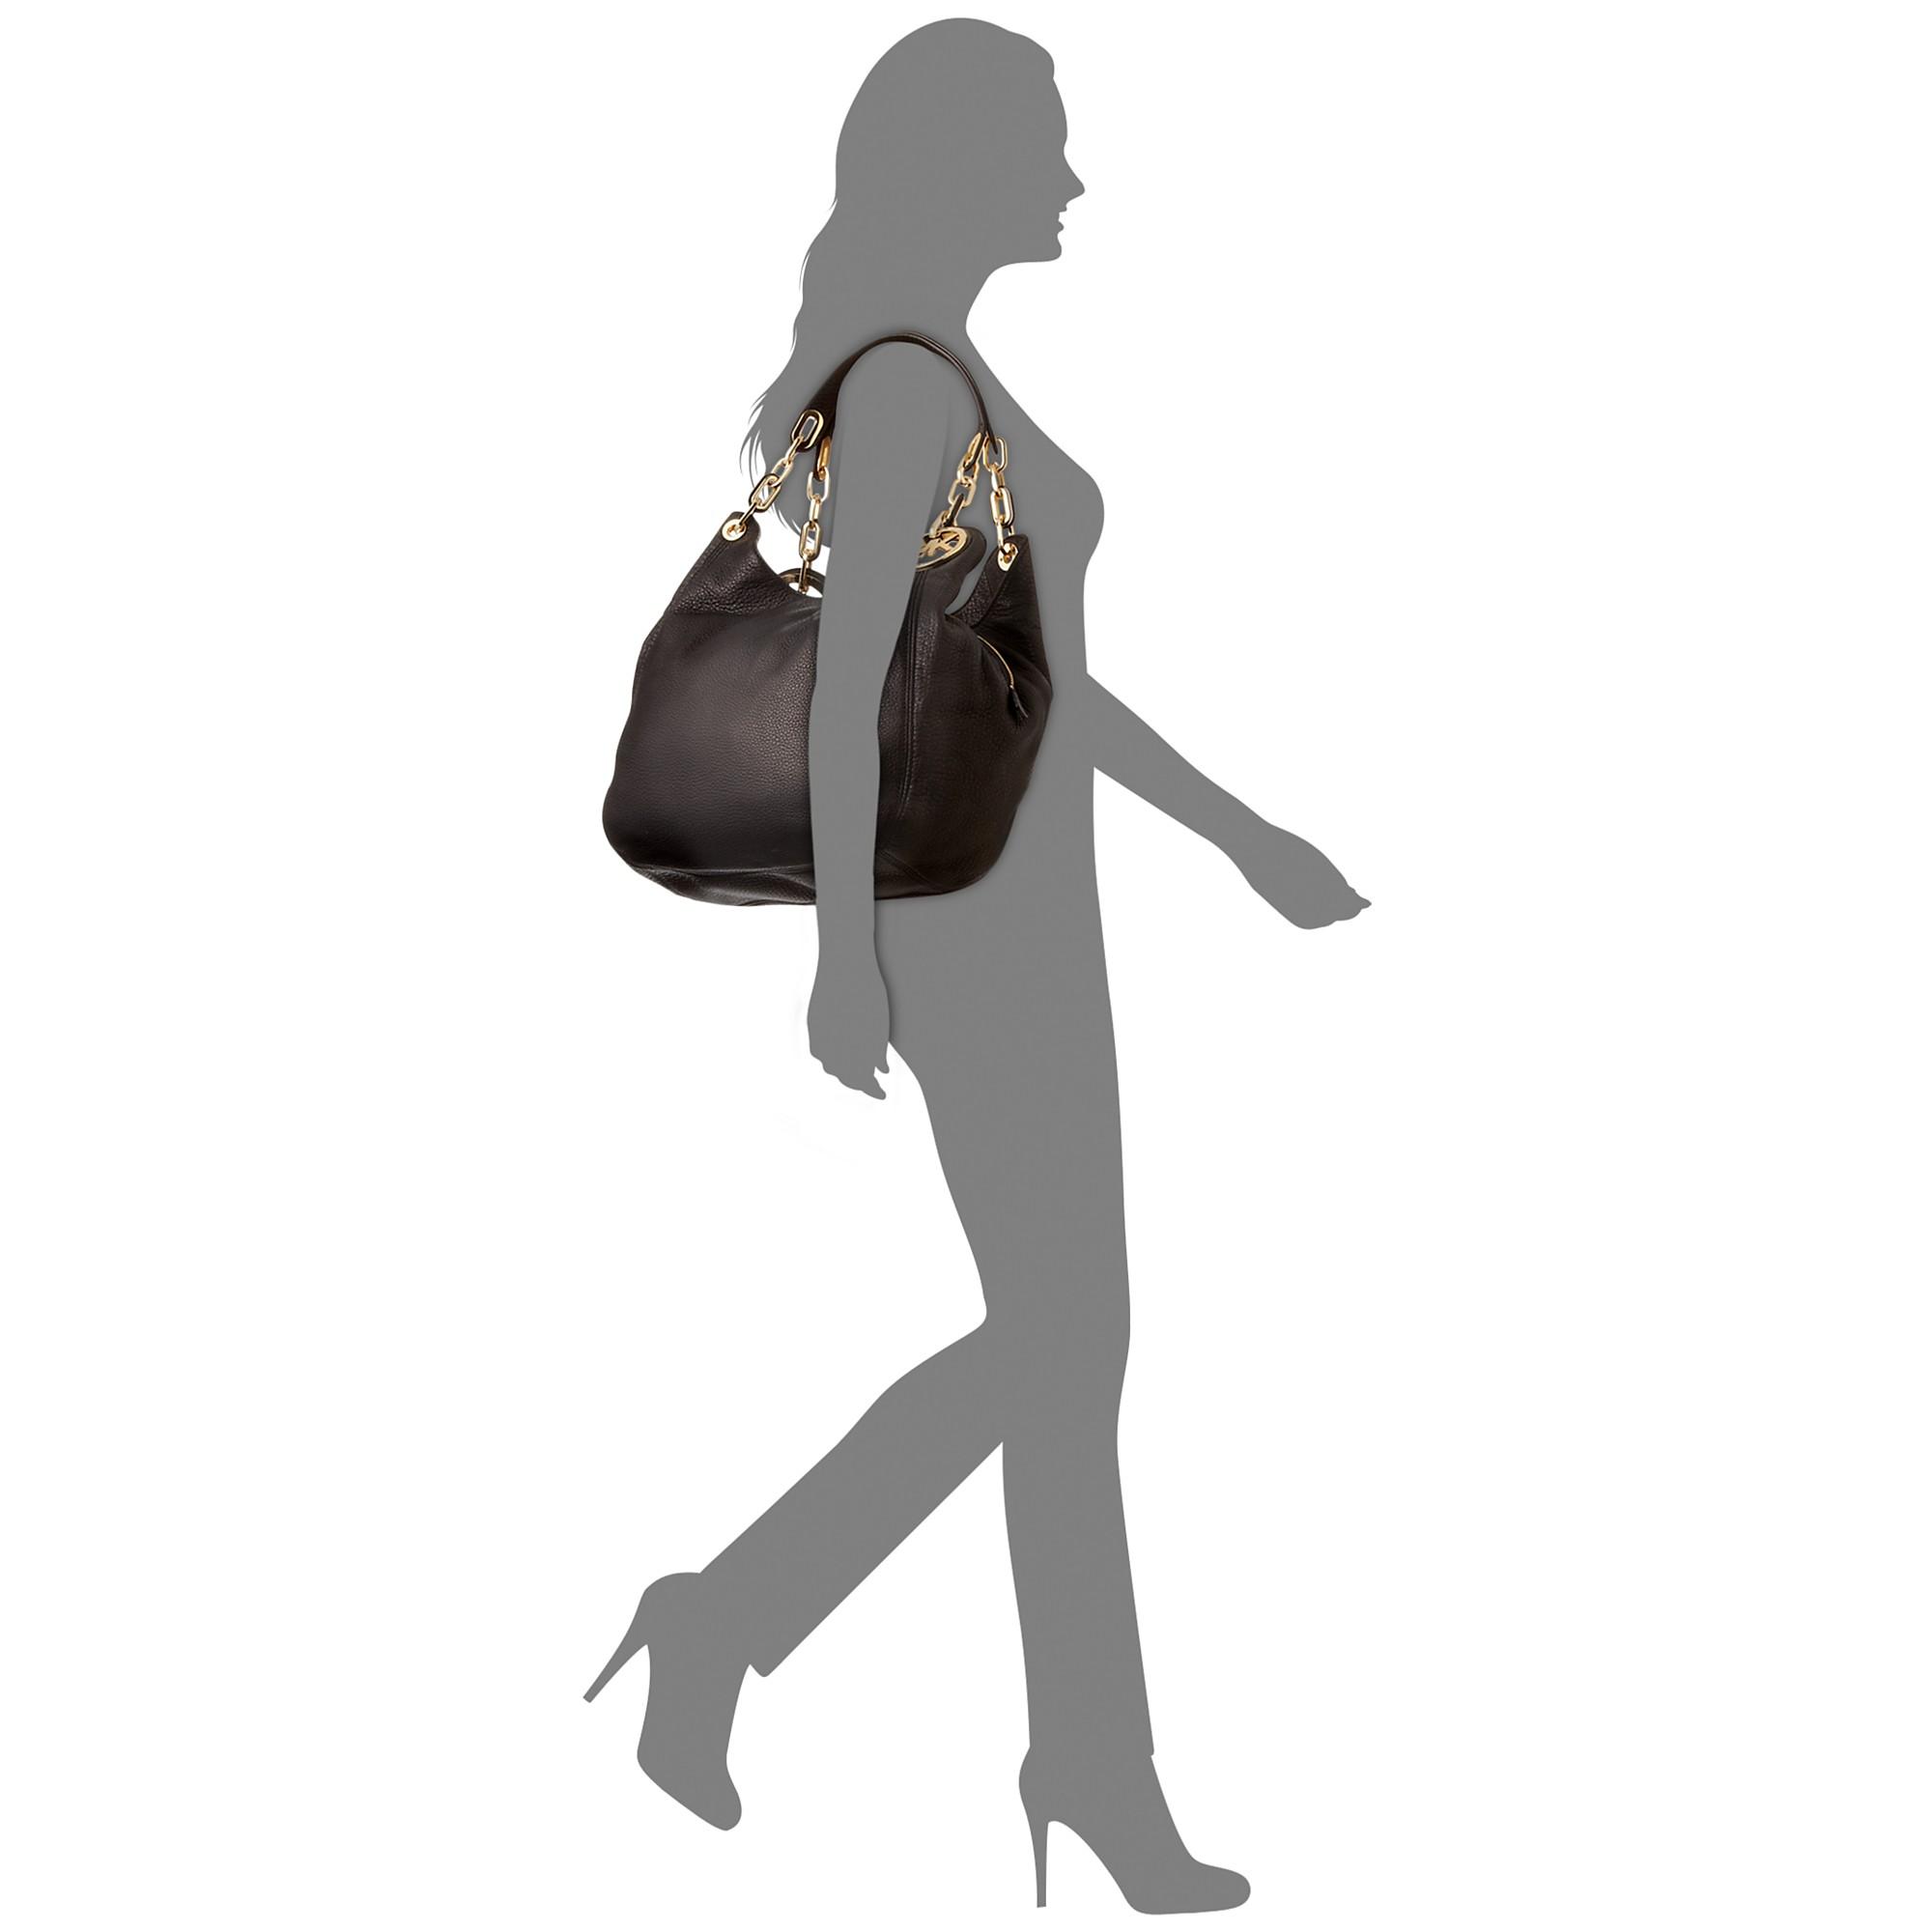 6ac0132e29b3 ... satchel a62b5 1bb50; discount lyst michael kors fulton large shoulder  tote in metallic c39b8 78198